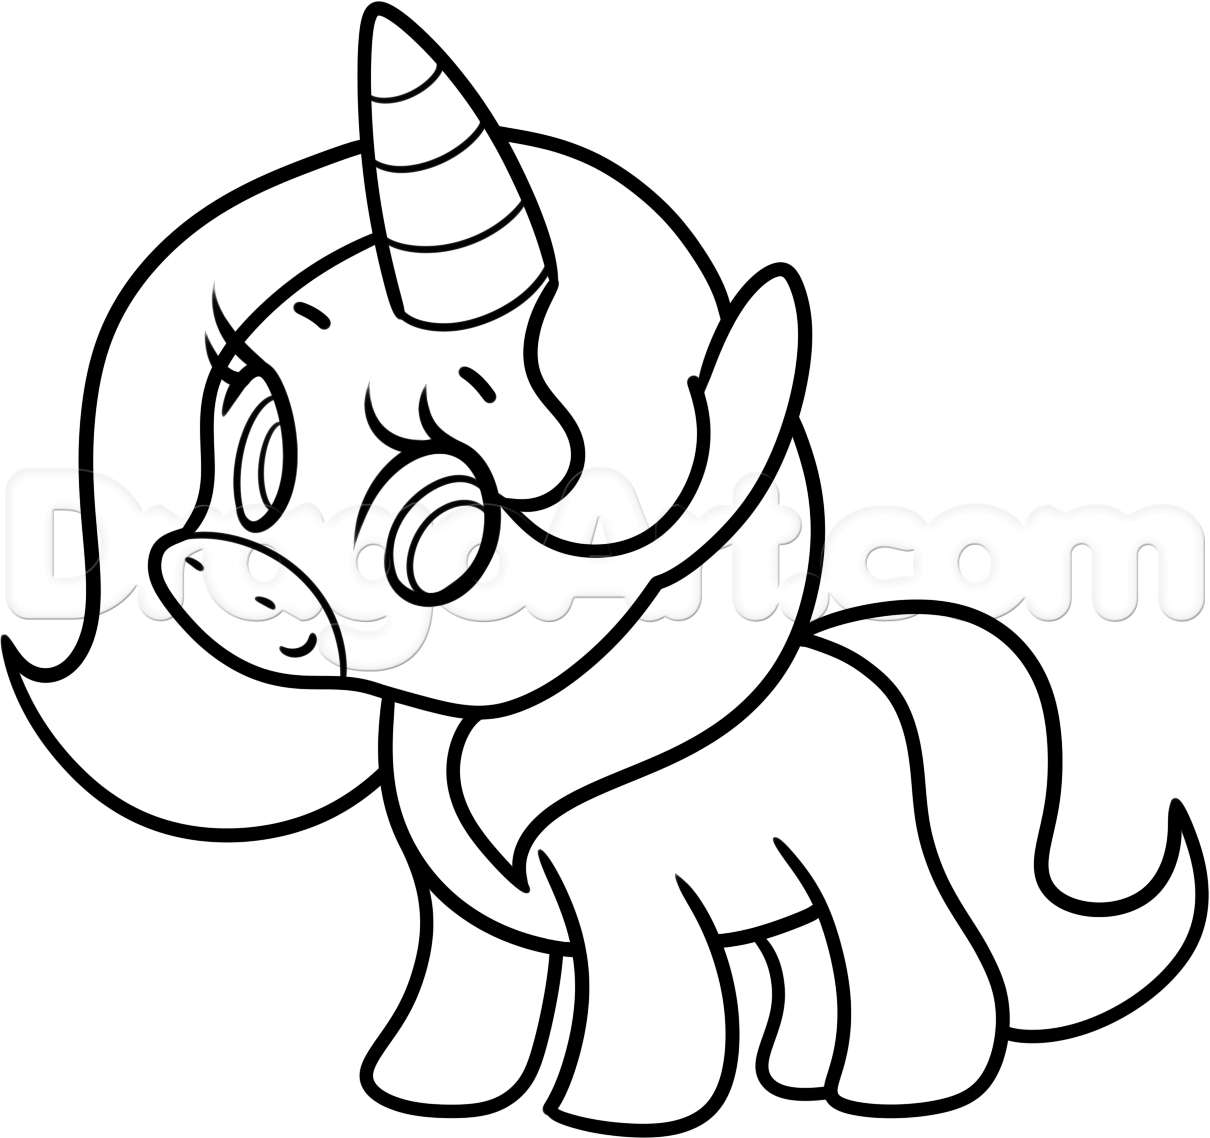 1210x1138 Cartoon Unicorn Drawing How To Draw A Cartoon Narwhal Unicorn